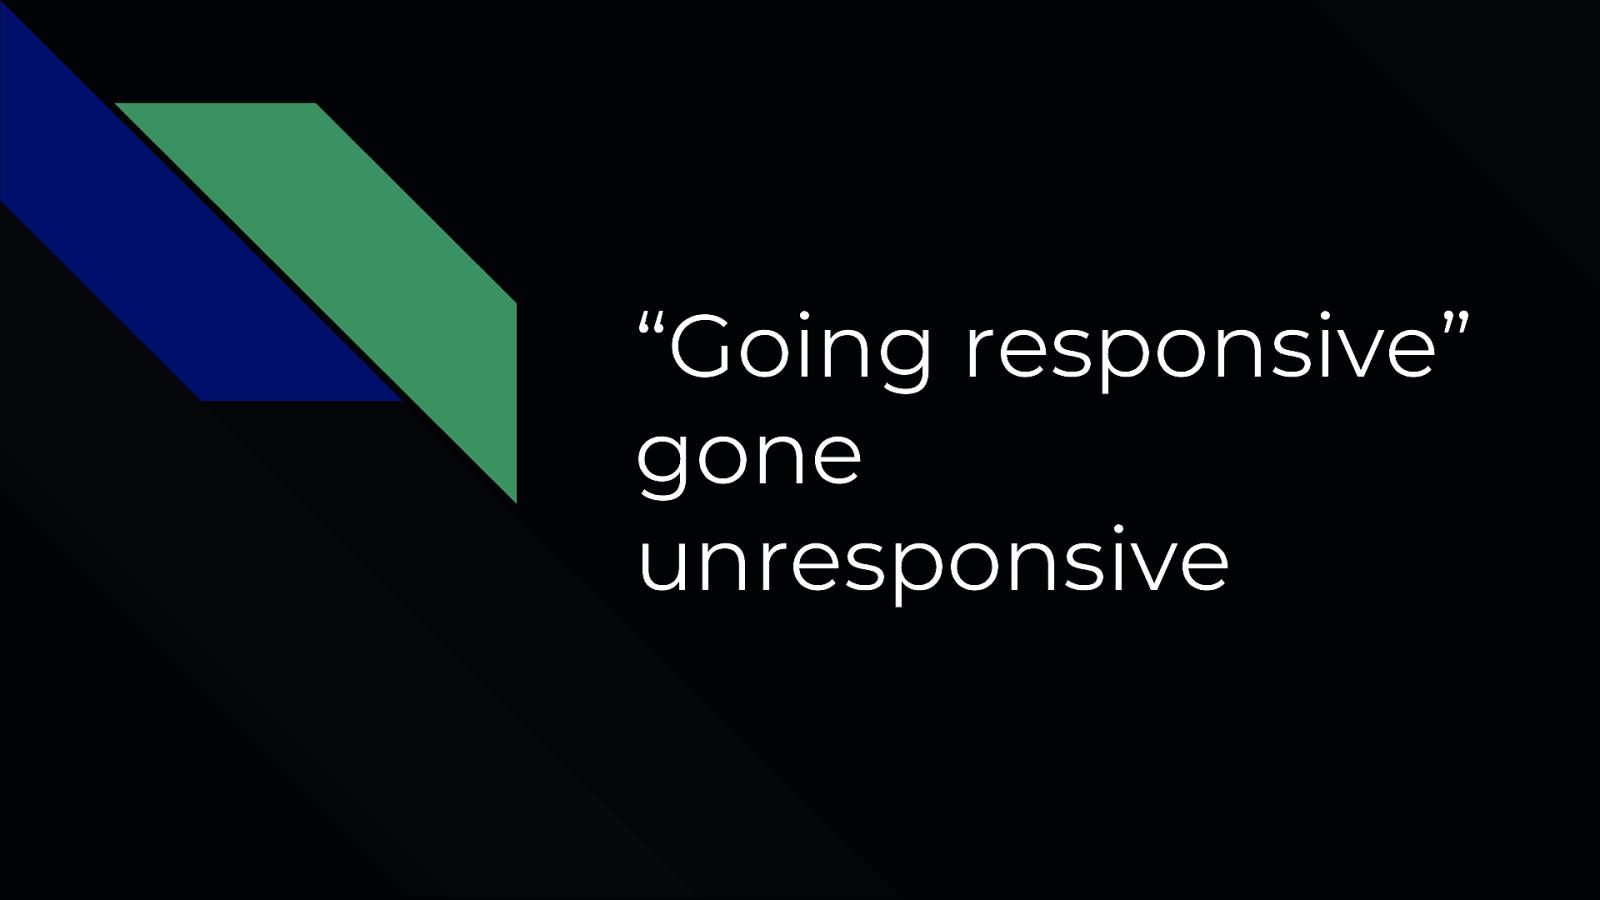 Going Responsive Gone Unresponsive